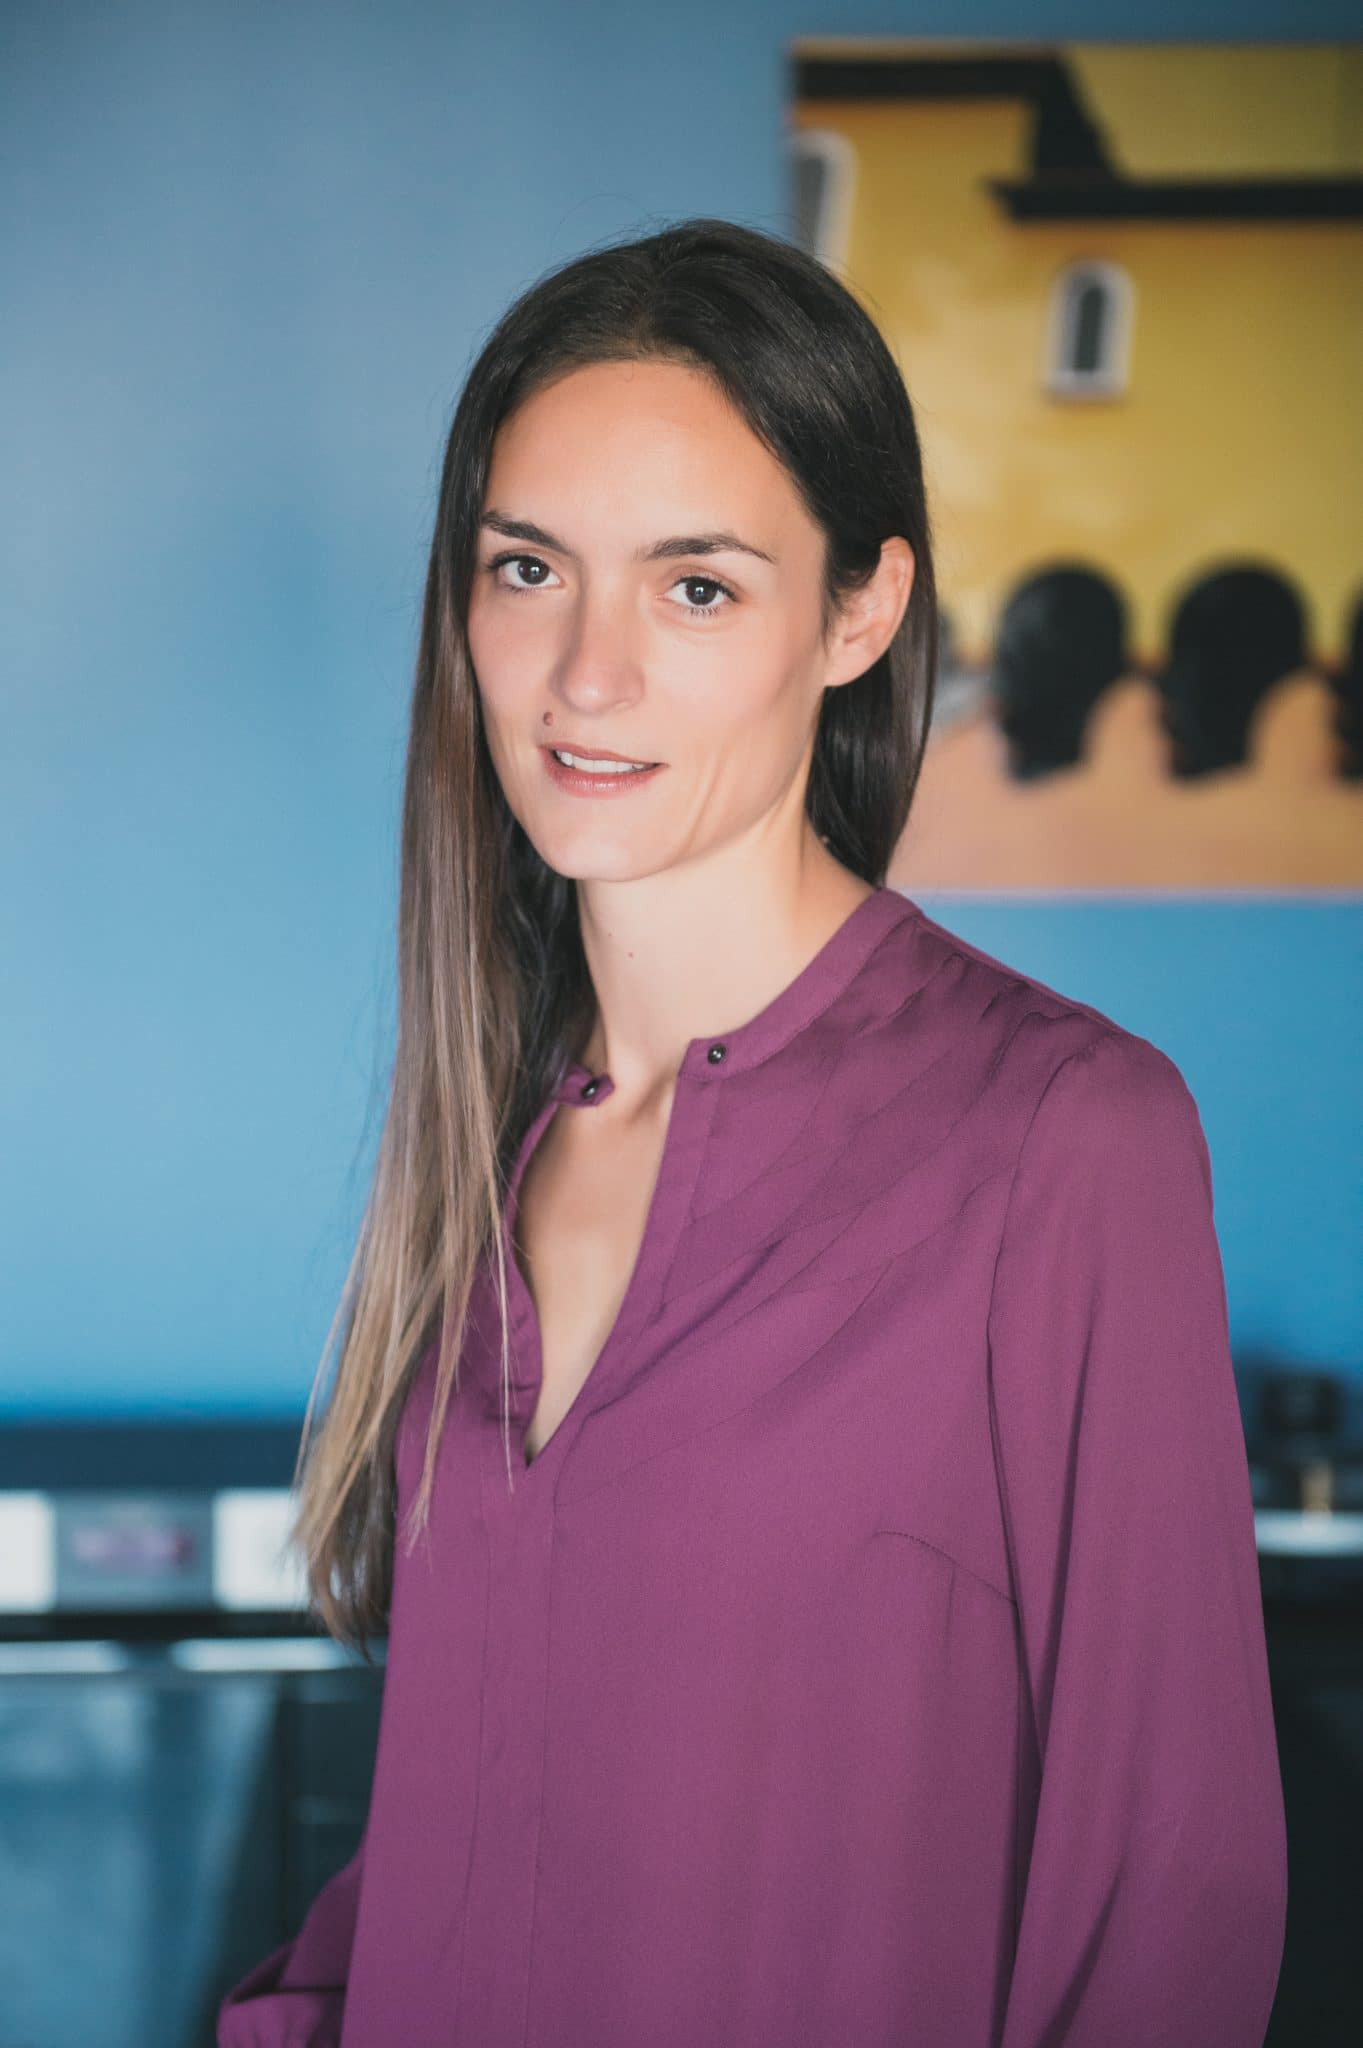 Andrée-Pedotti-La-Soffitta-Di-Gi